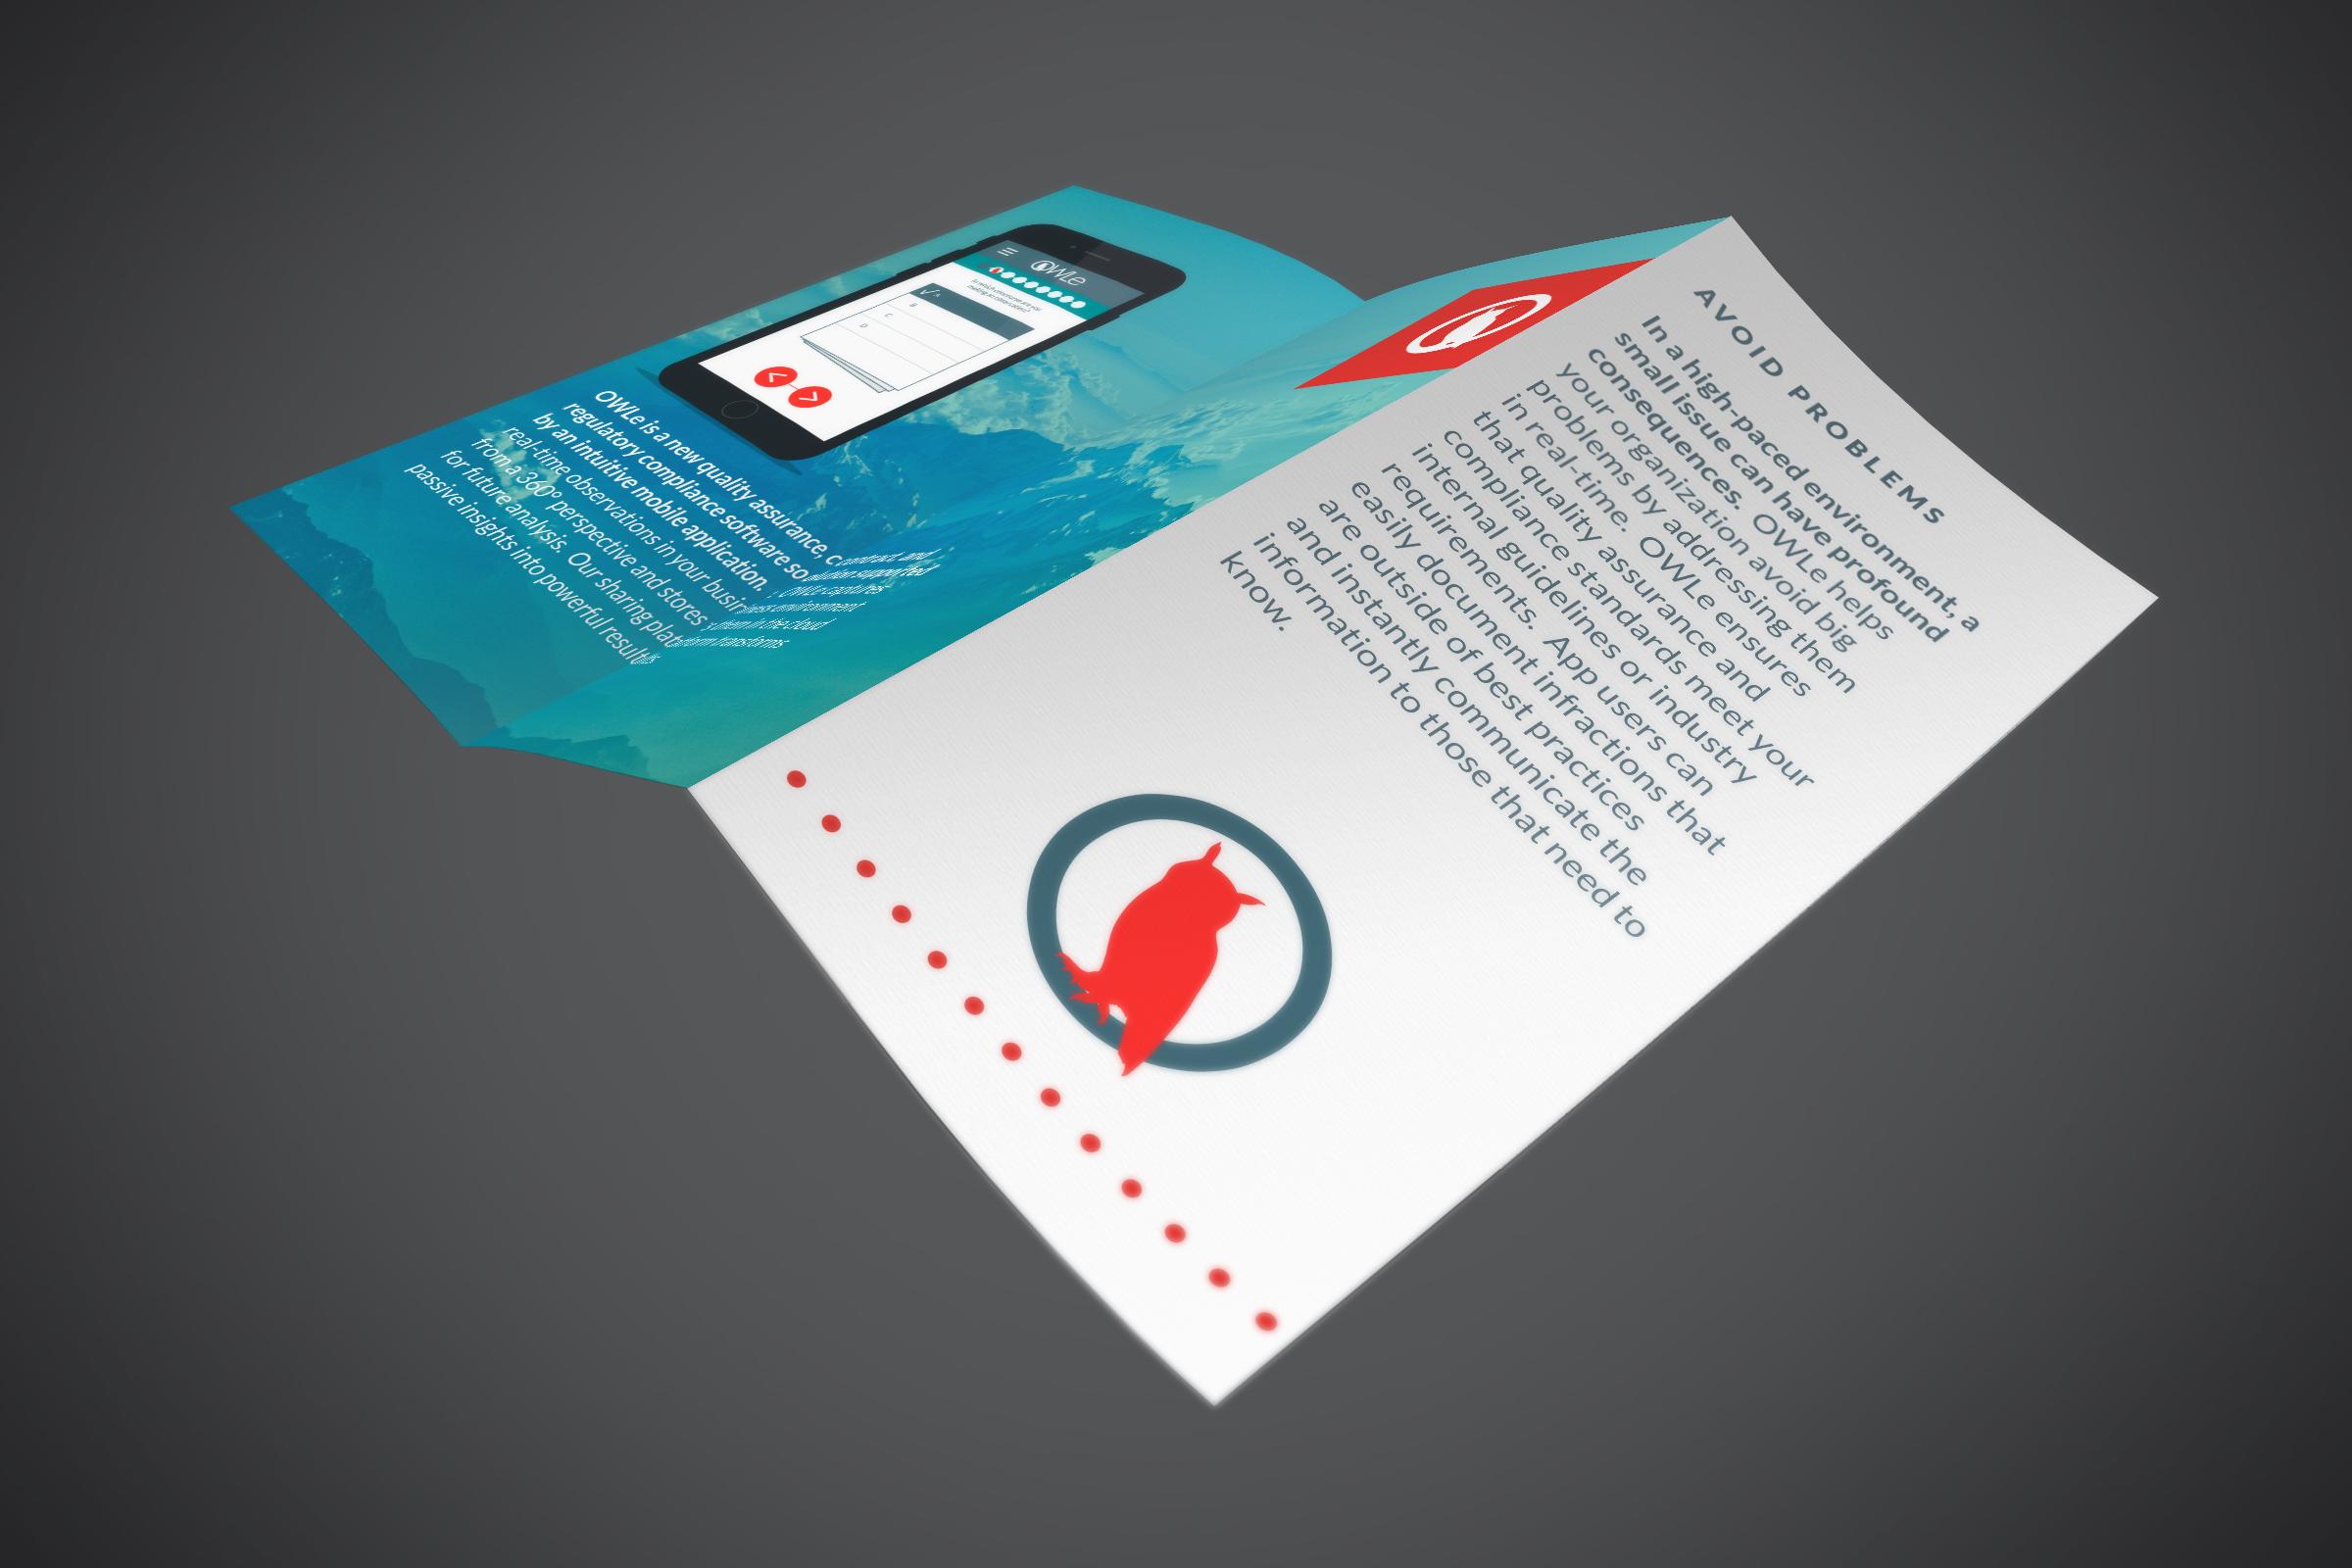 hearthfire-creative-marketing-collateral-brand-identity-designer-denver-colorado-owle-7.jpg